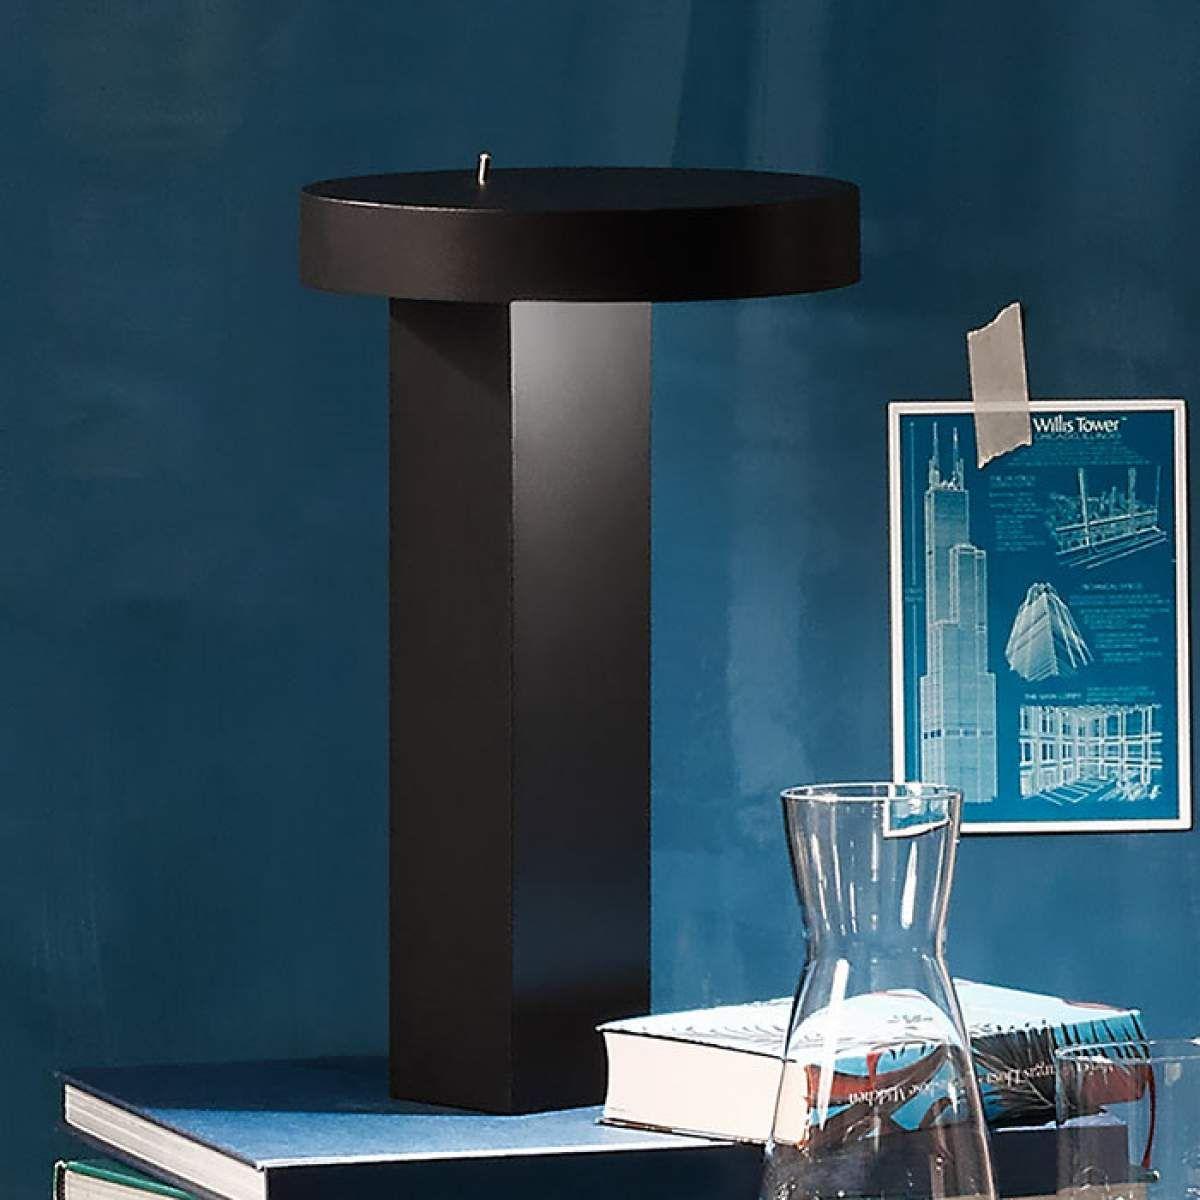 Küchenideen 2018 bilder lampe led dimmbar  moderne leuchten  design tischlampe